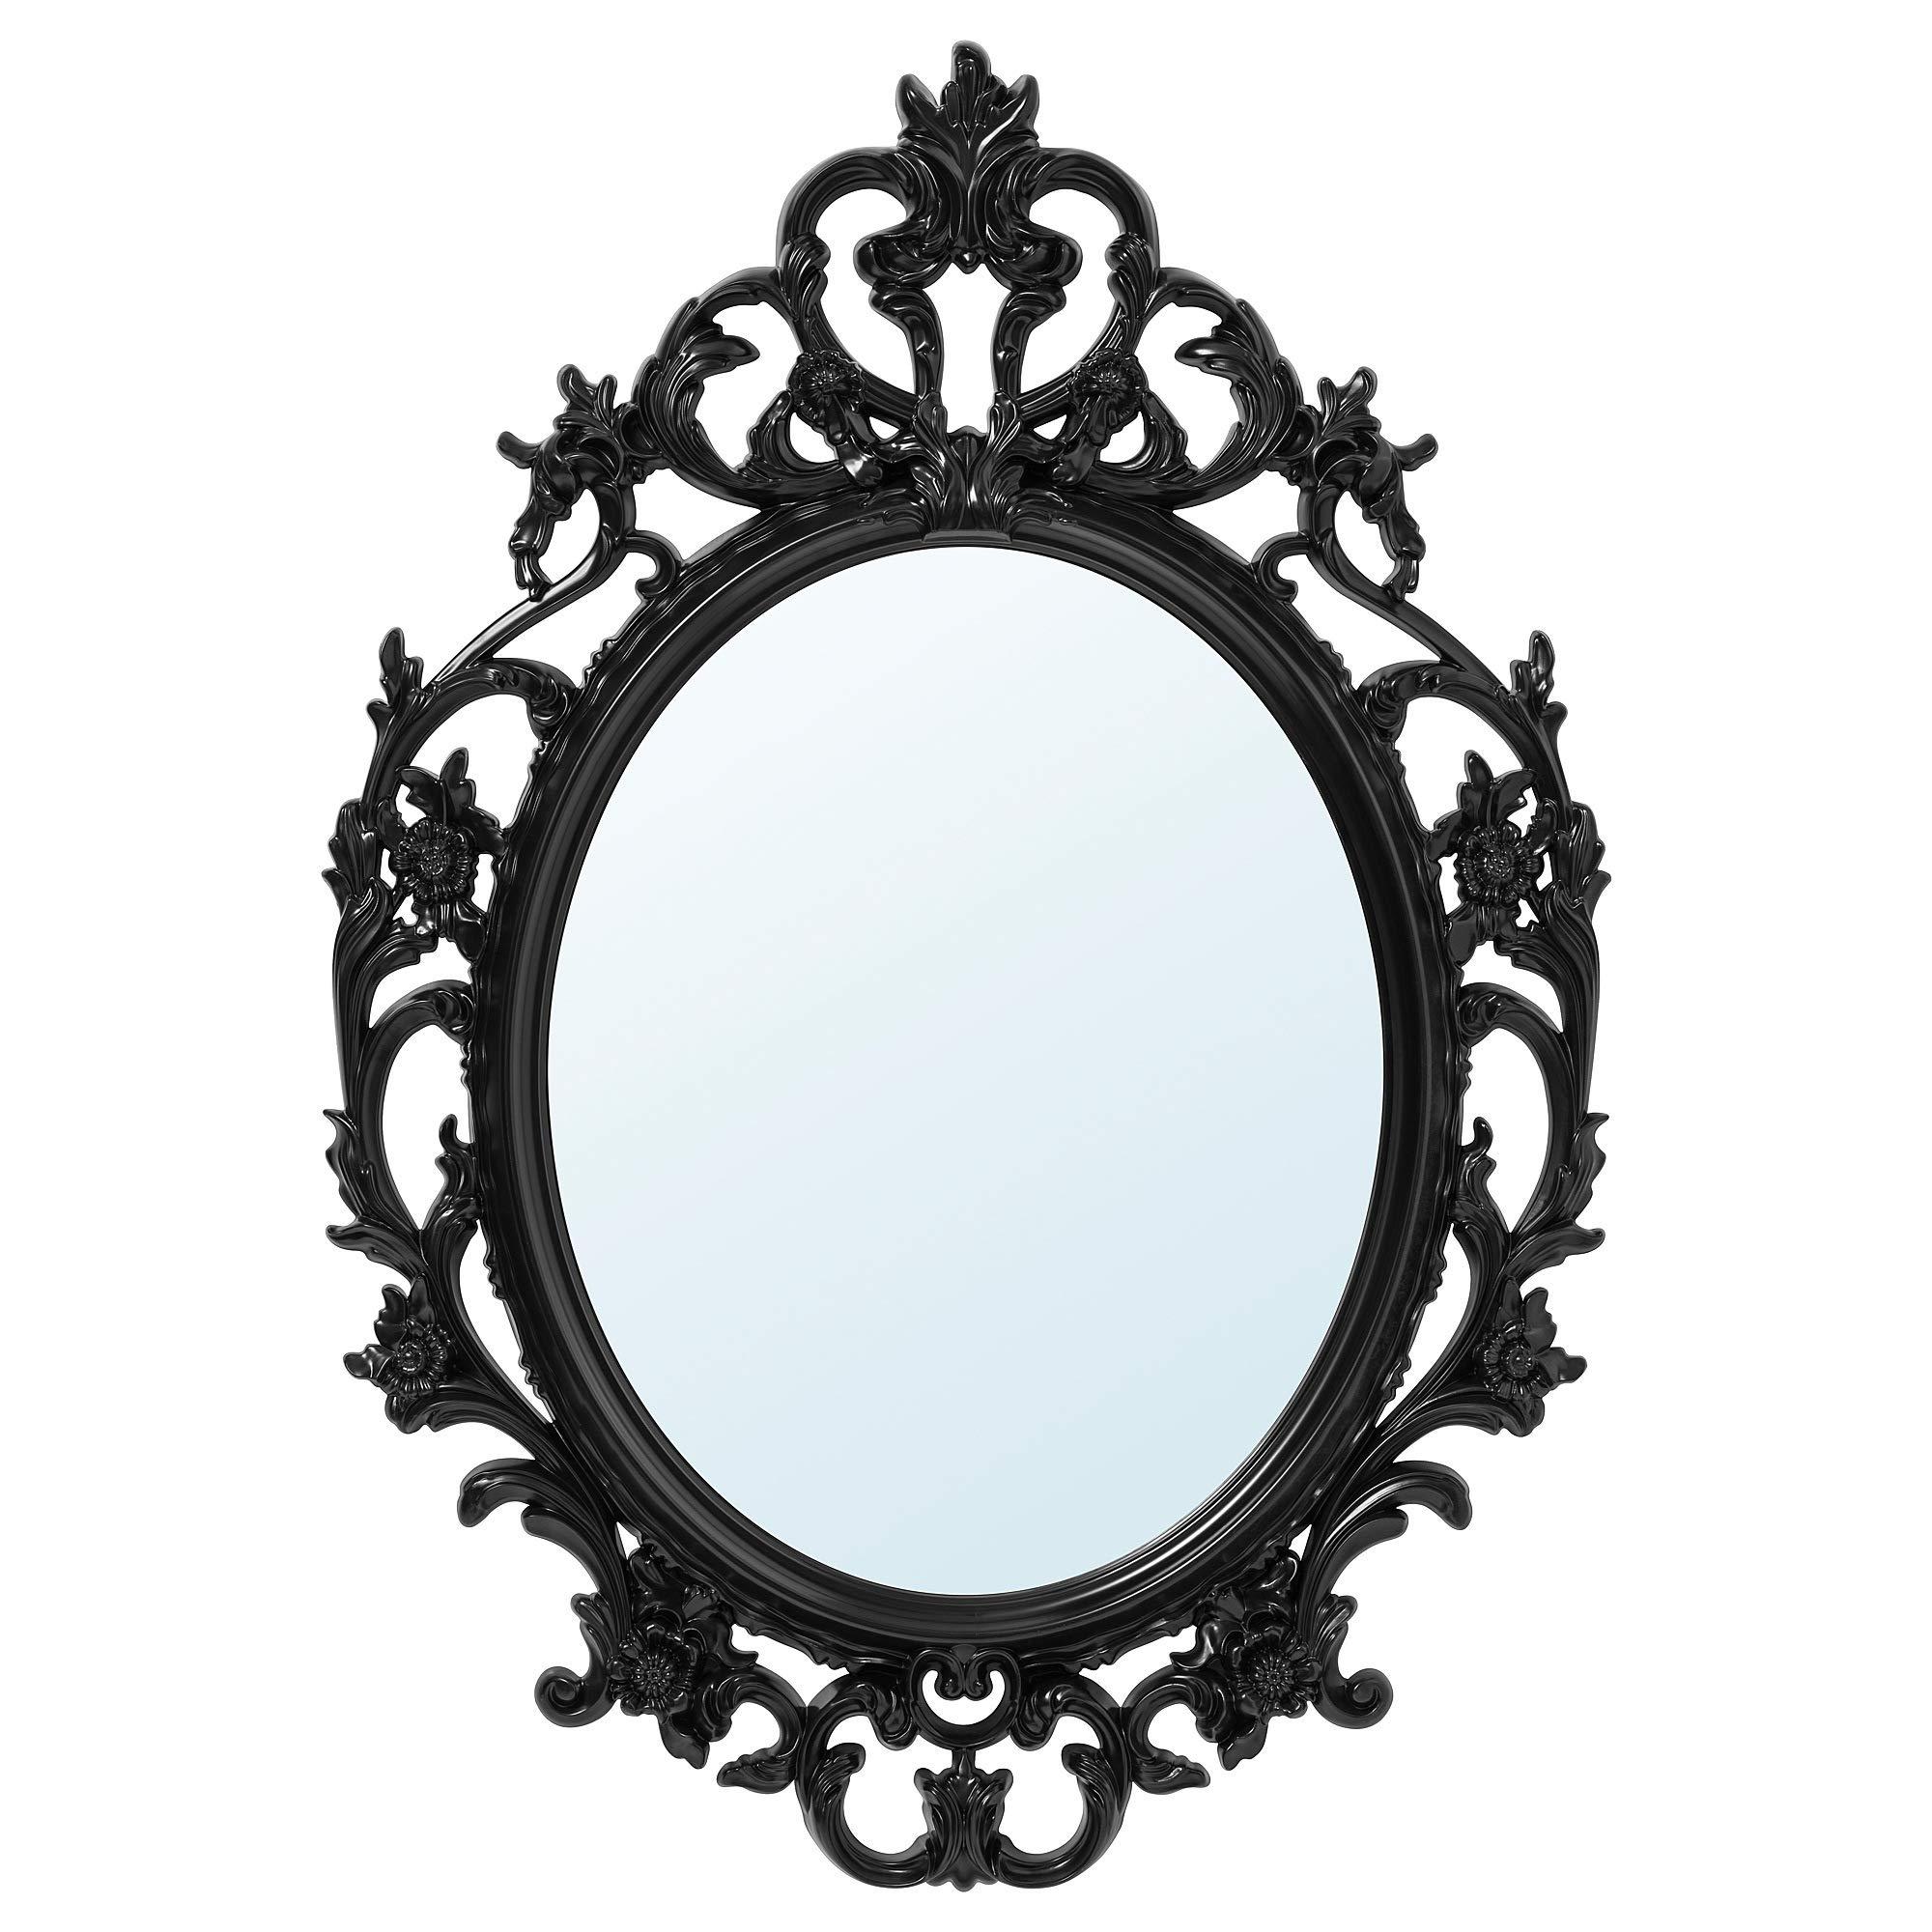 Ikea 402 137 59 Ung Drill Mirror Oval Black Wall Mounted Mirrors Amazon Com Au